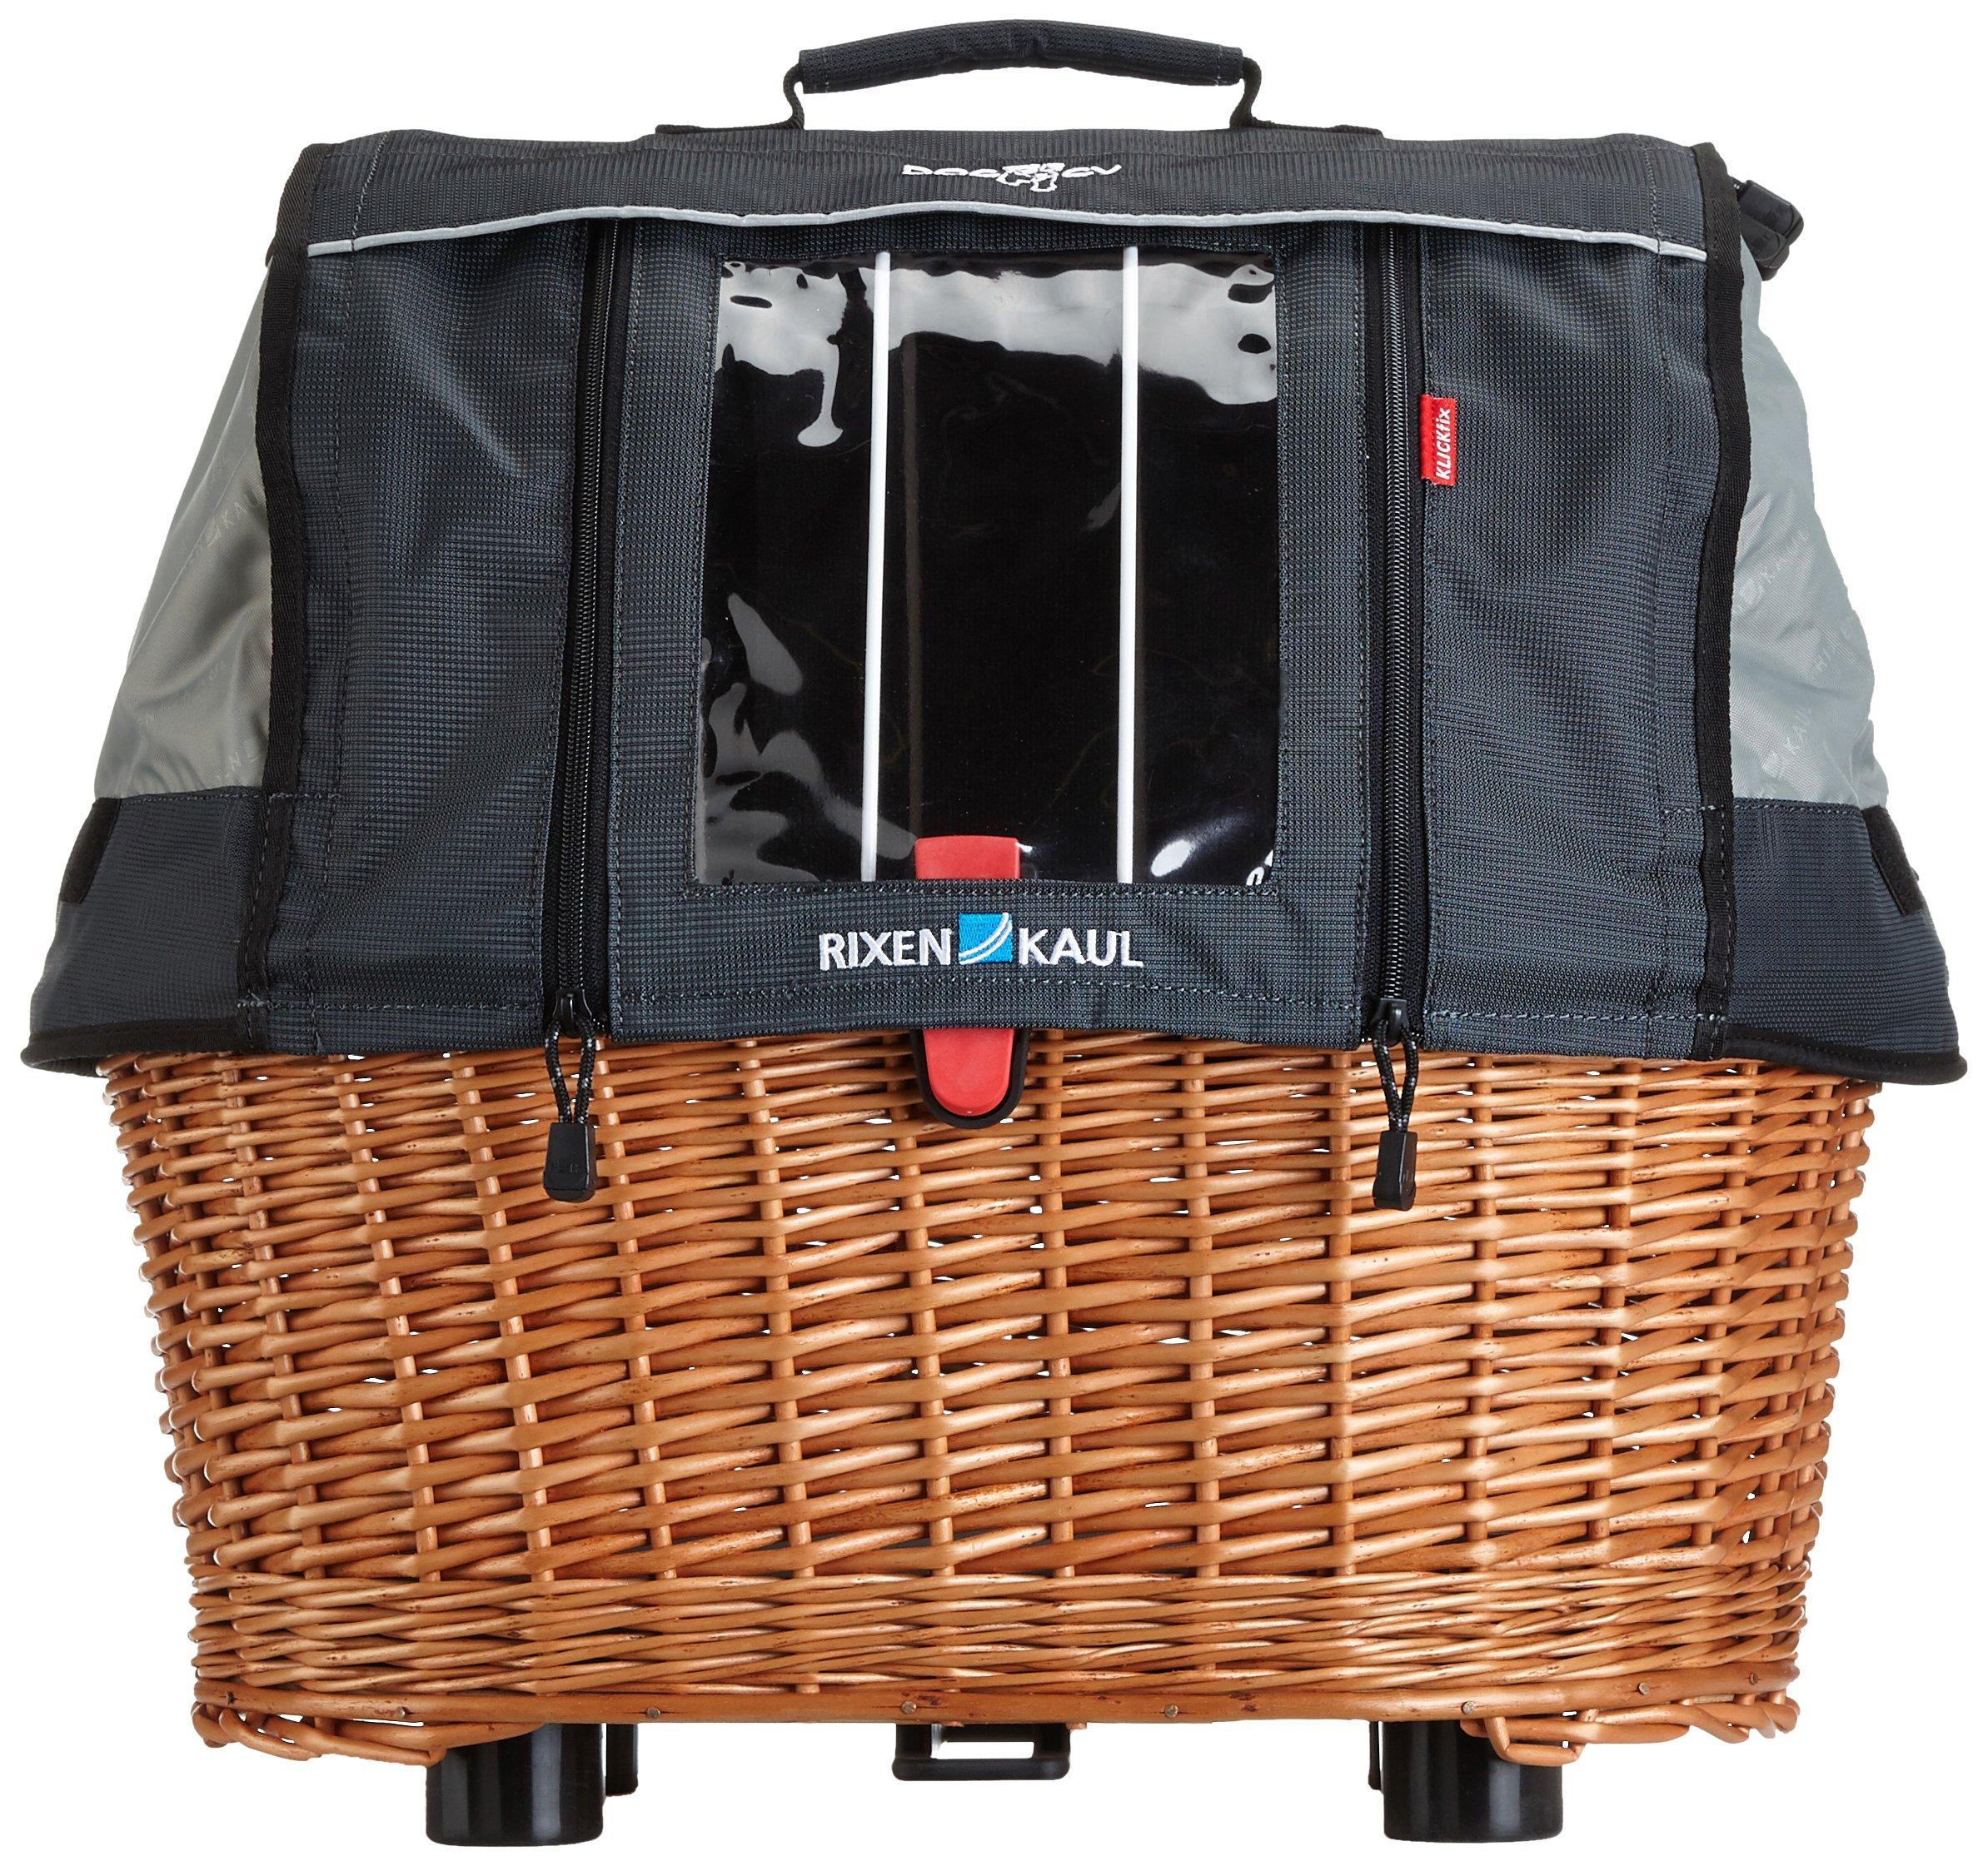 KlickFix rear basket Rixen & Kaul Doggy Basket Plus GTA by KlickFix (Image #1)